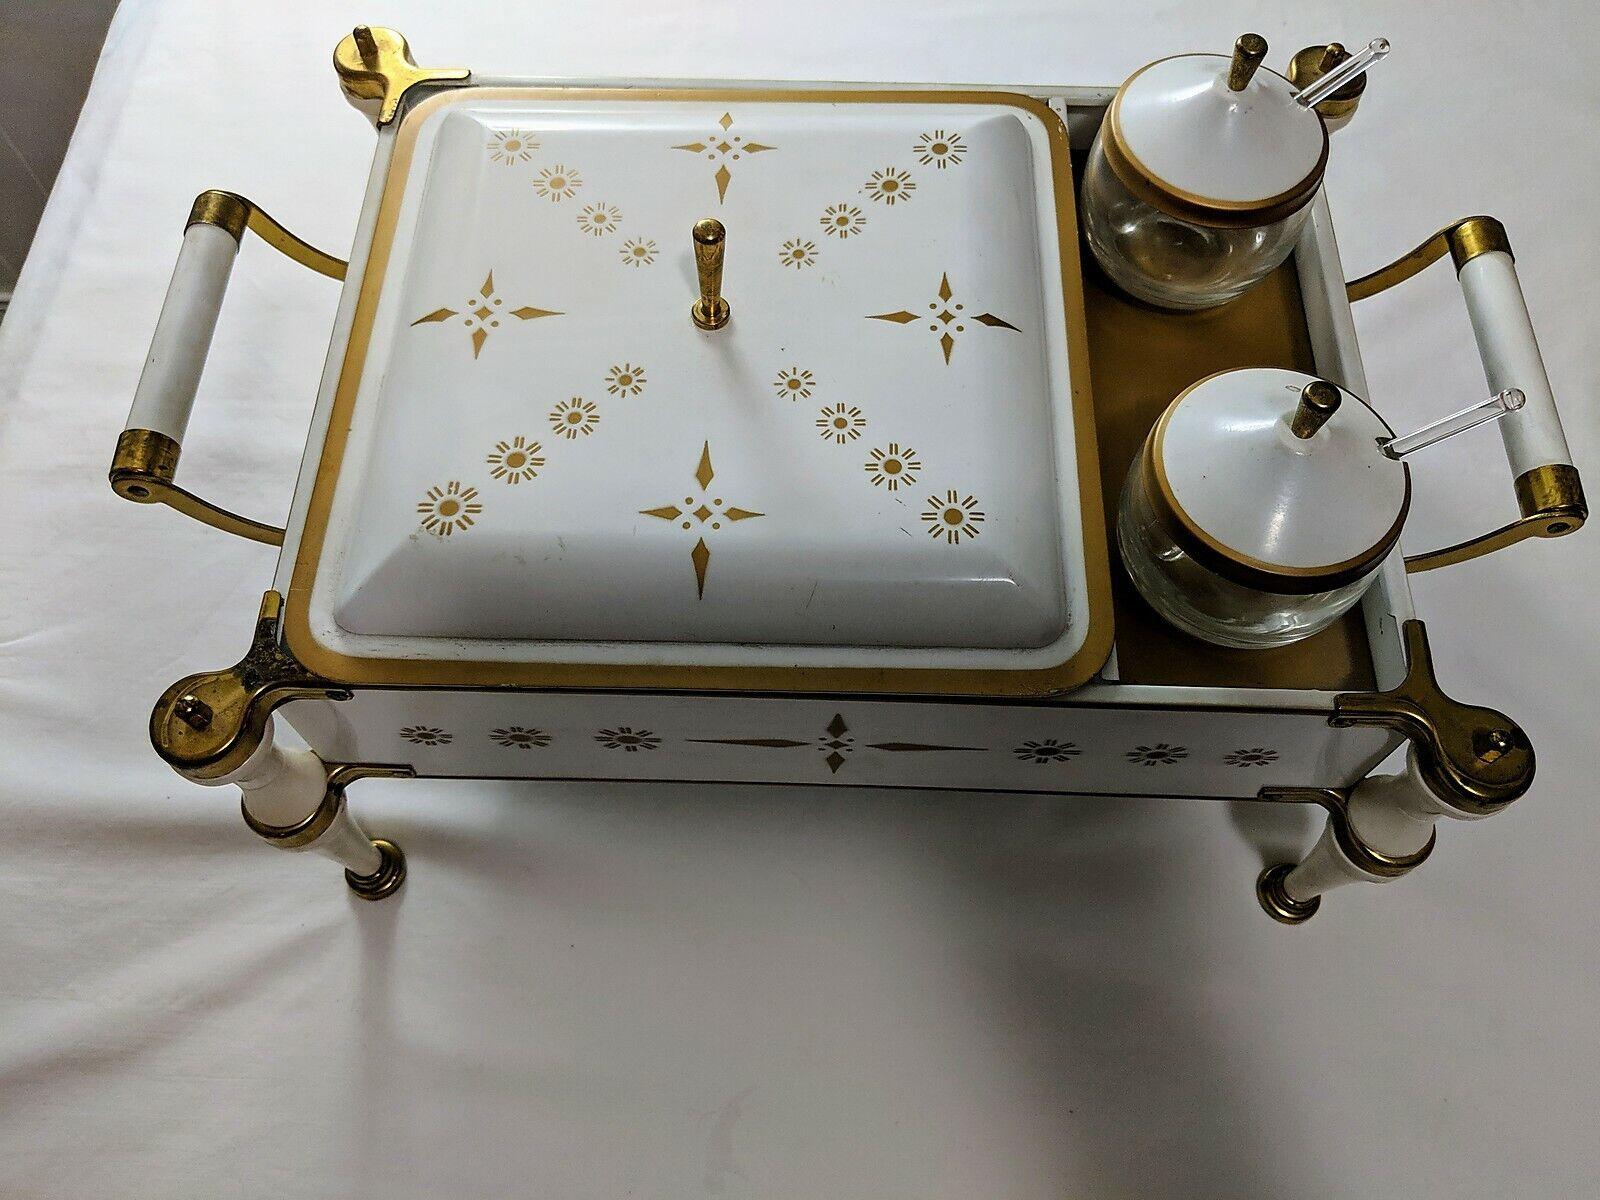 MID-CENTURY MODERN Brass frougeteHommest Dish Warmer livré avec 2 Couvercle CondiHommest Pots